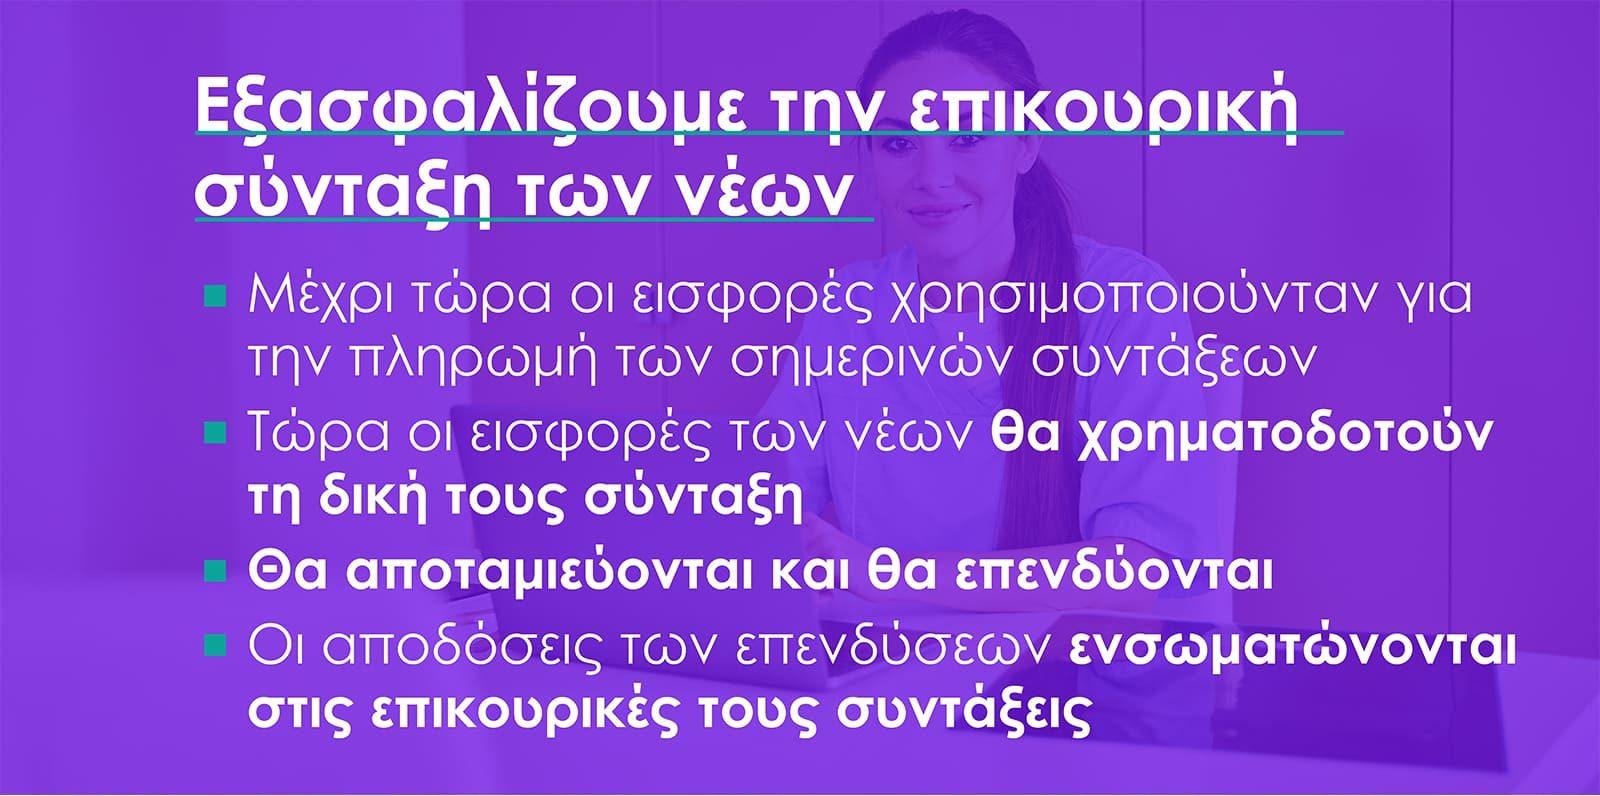 asfalistiko_neoi_HQ-4